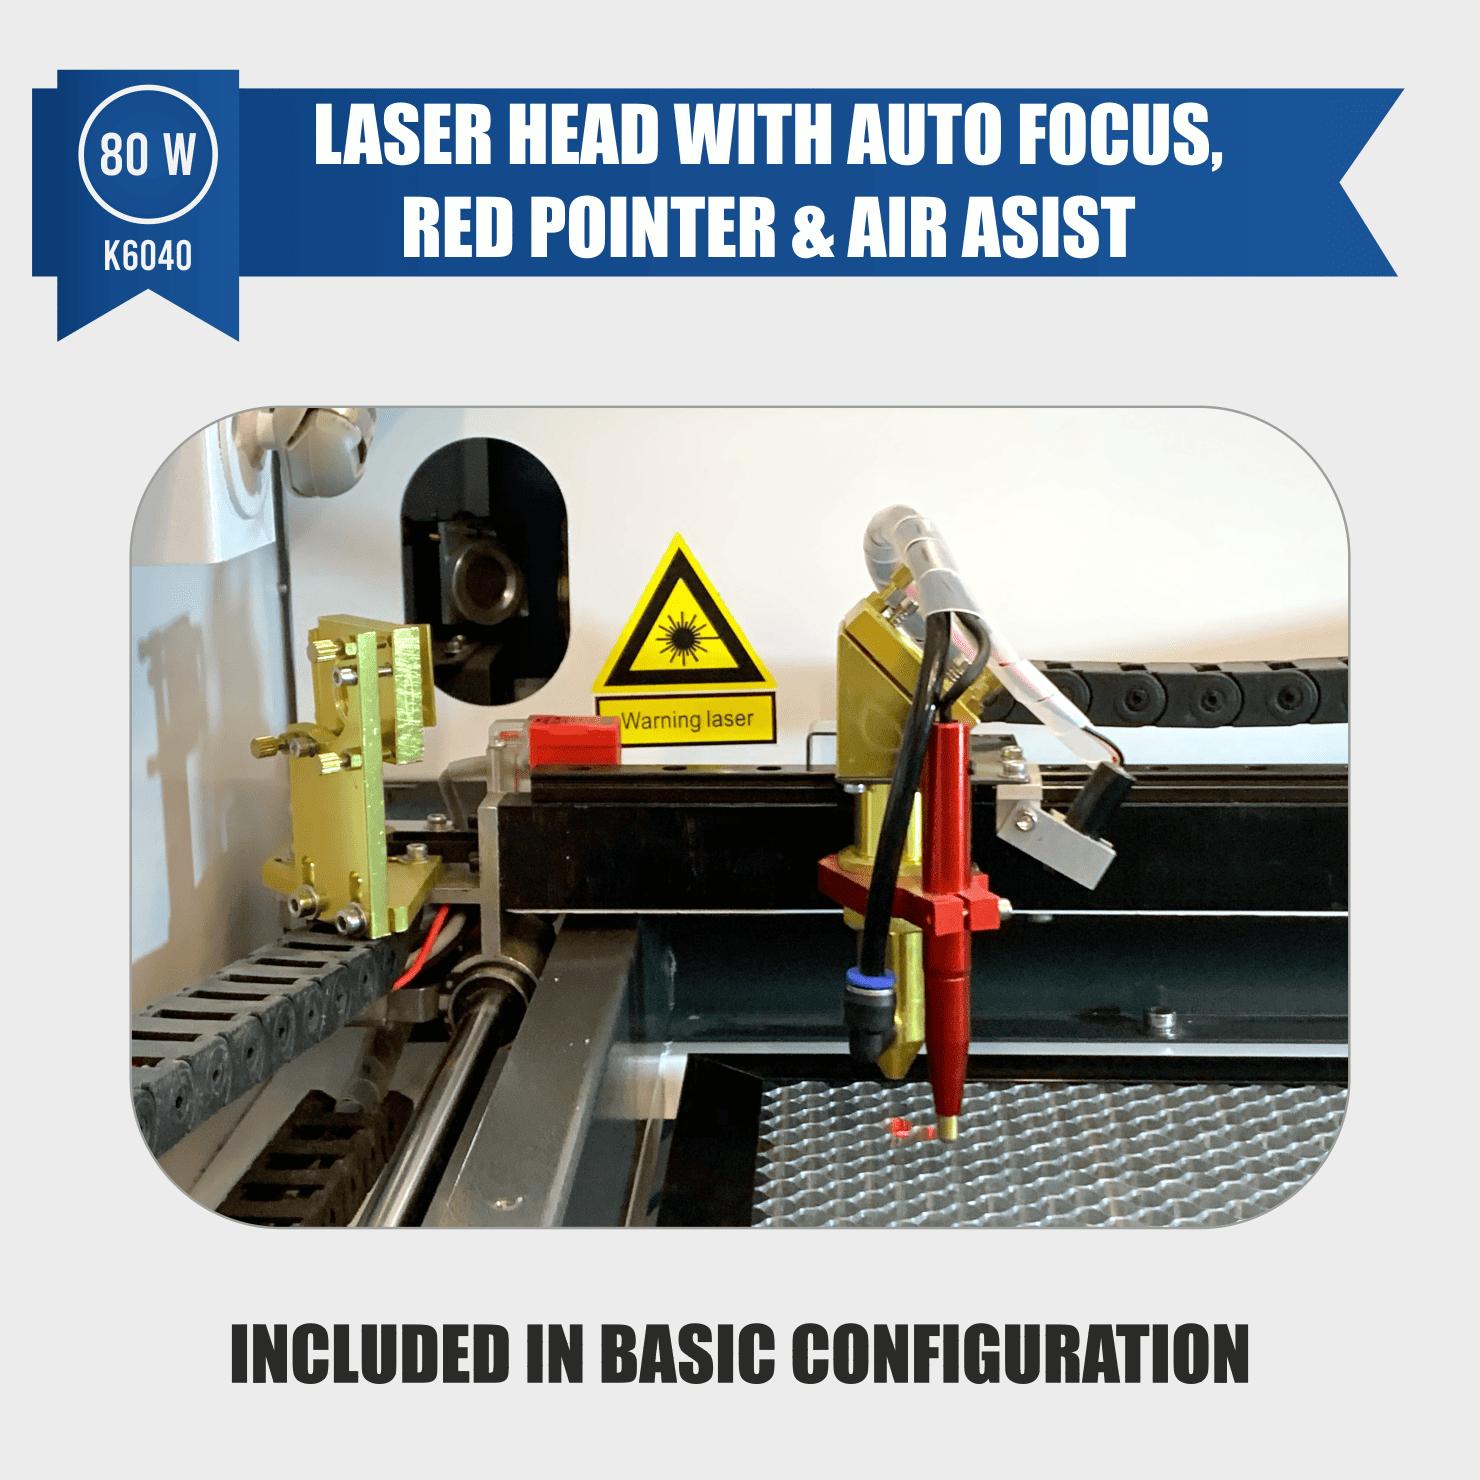 laser engraver 80w with auto focus